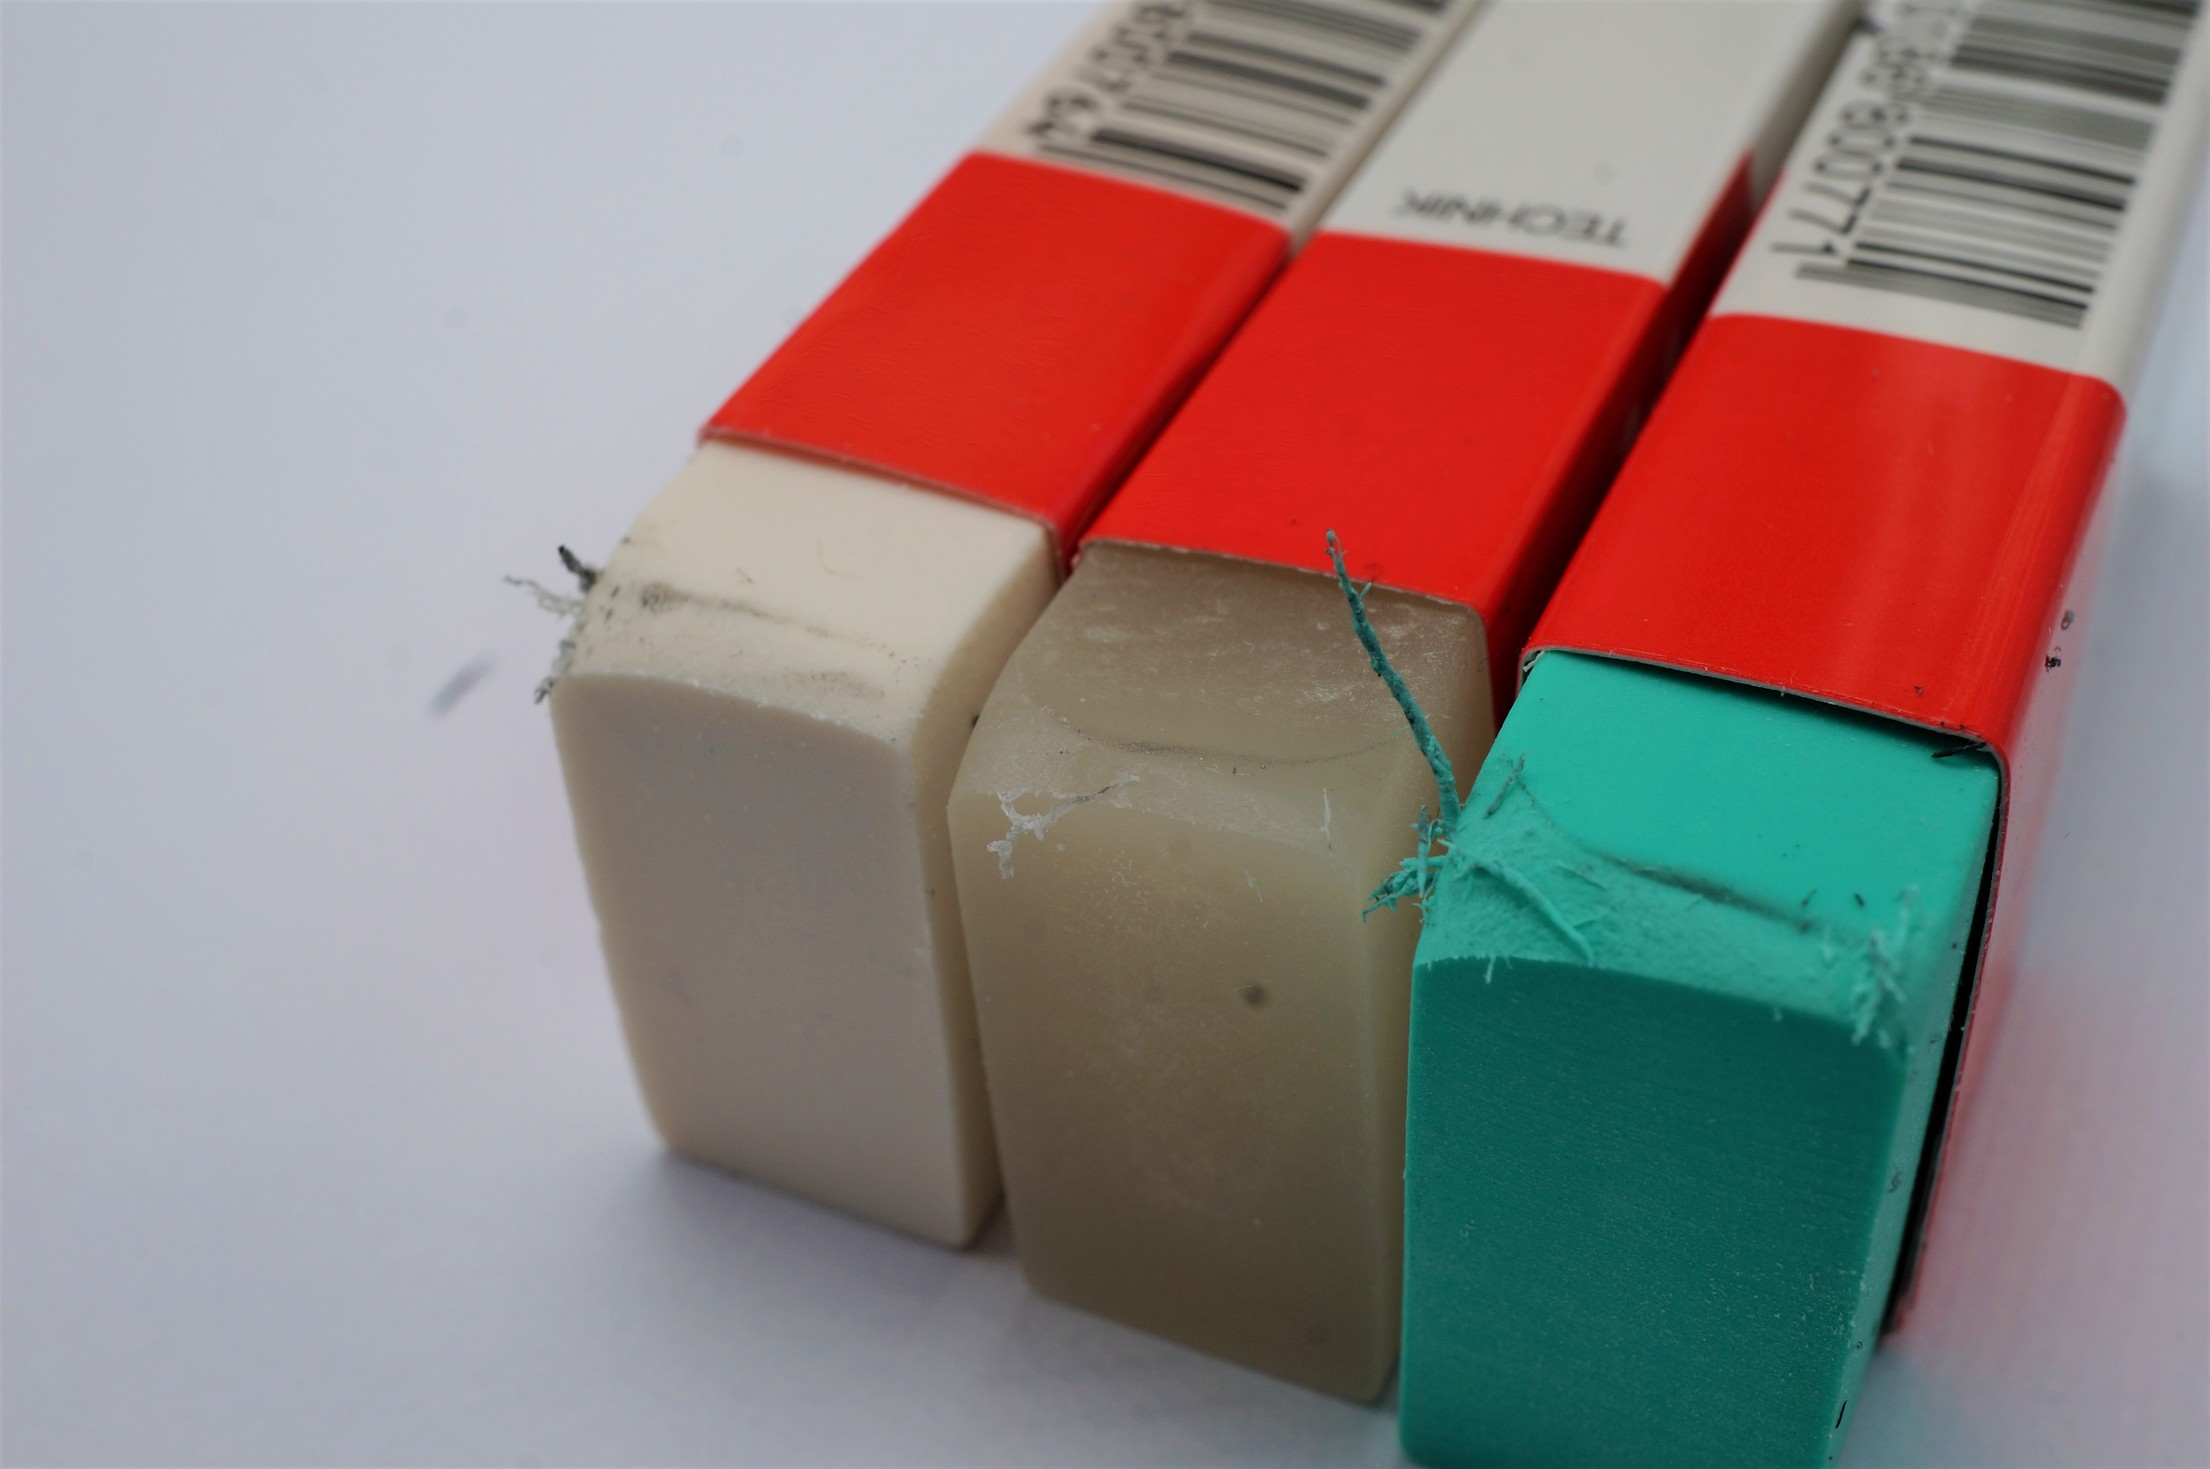 Caran d'Ache Block Erasers